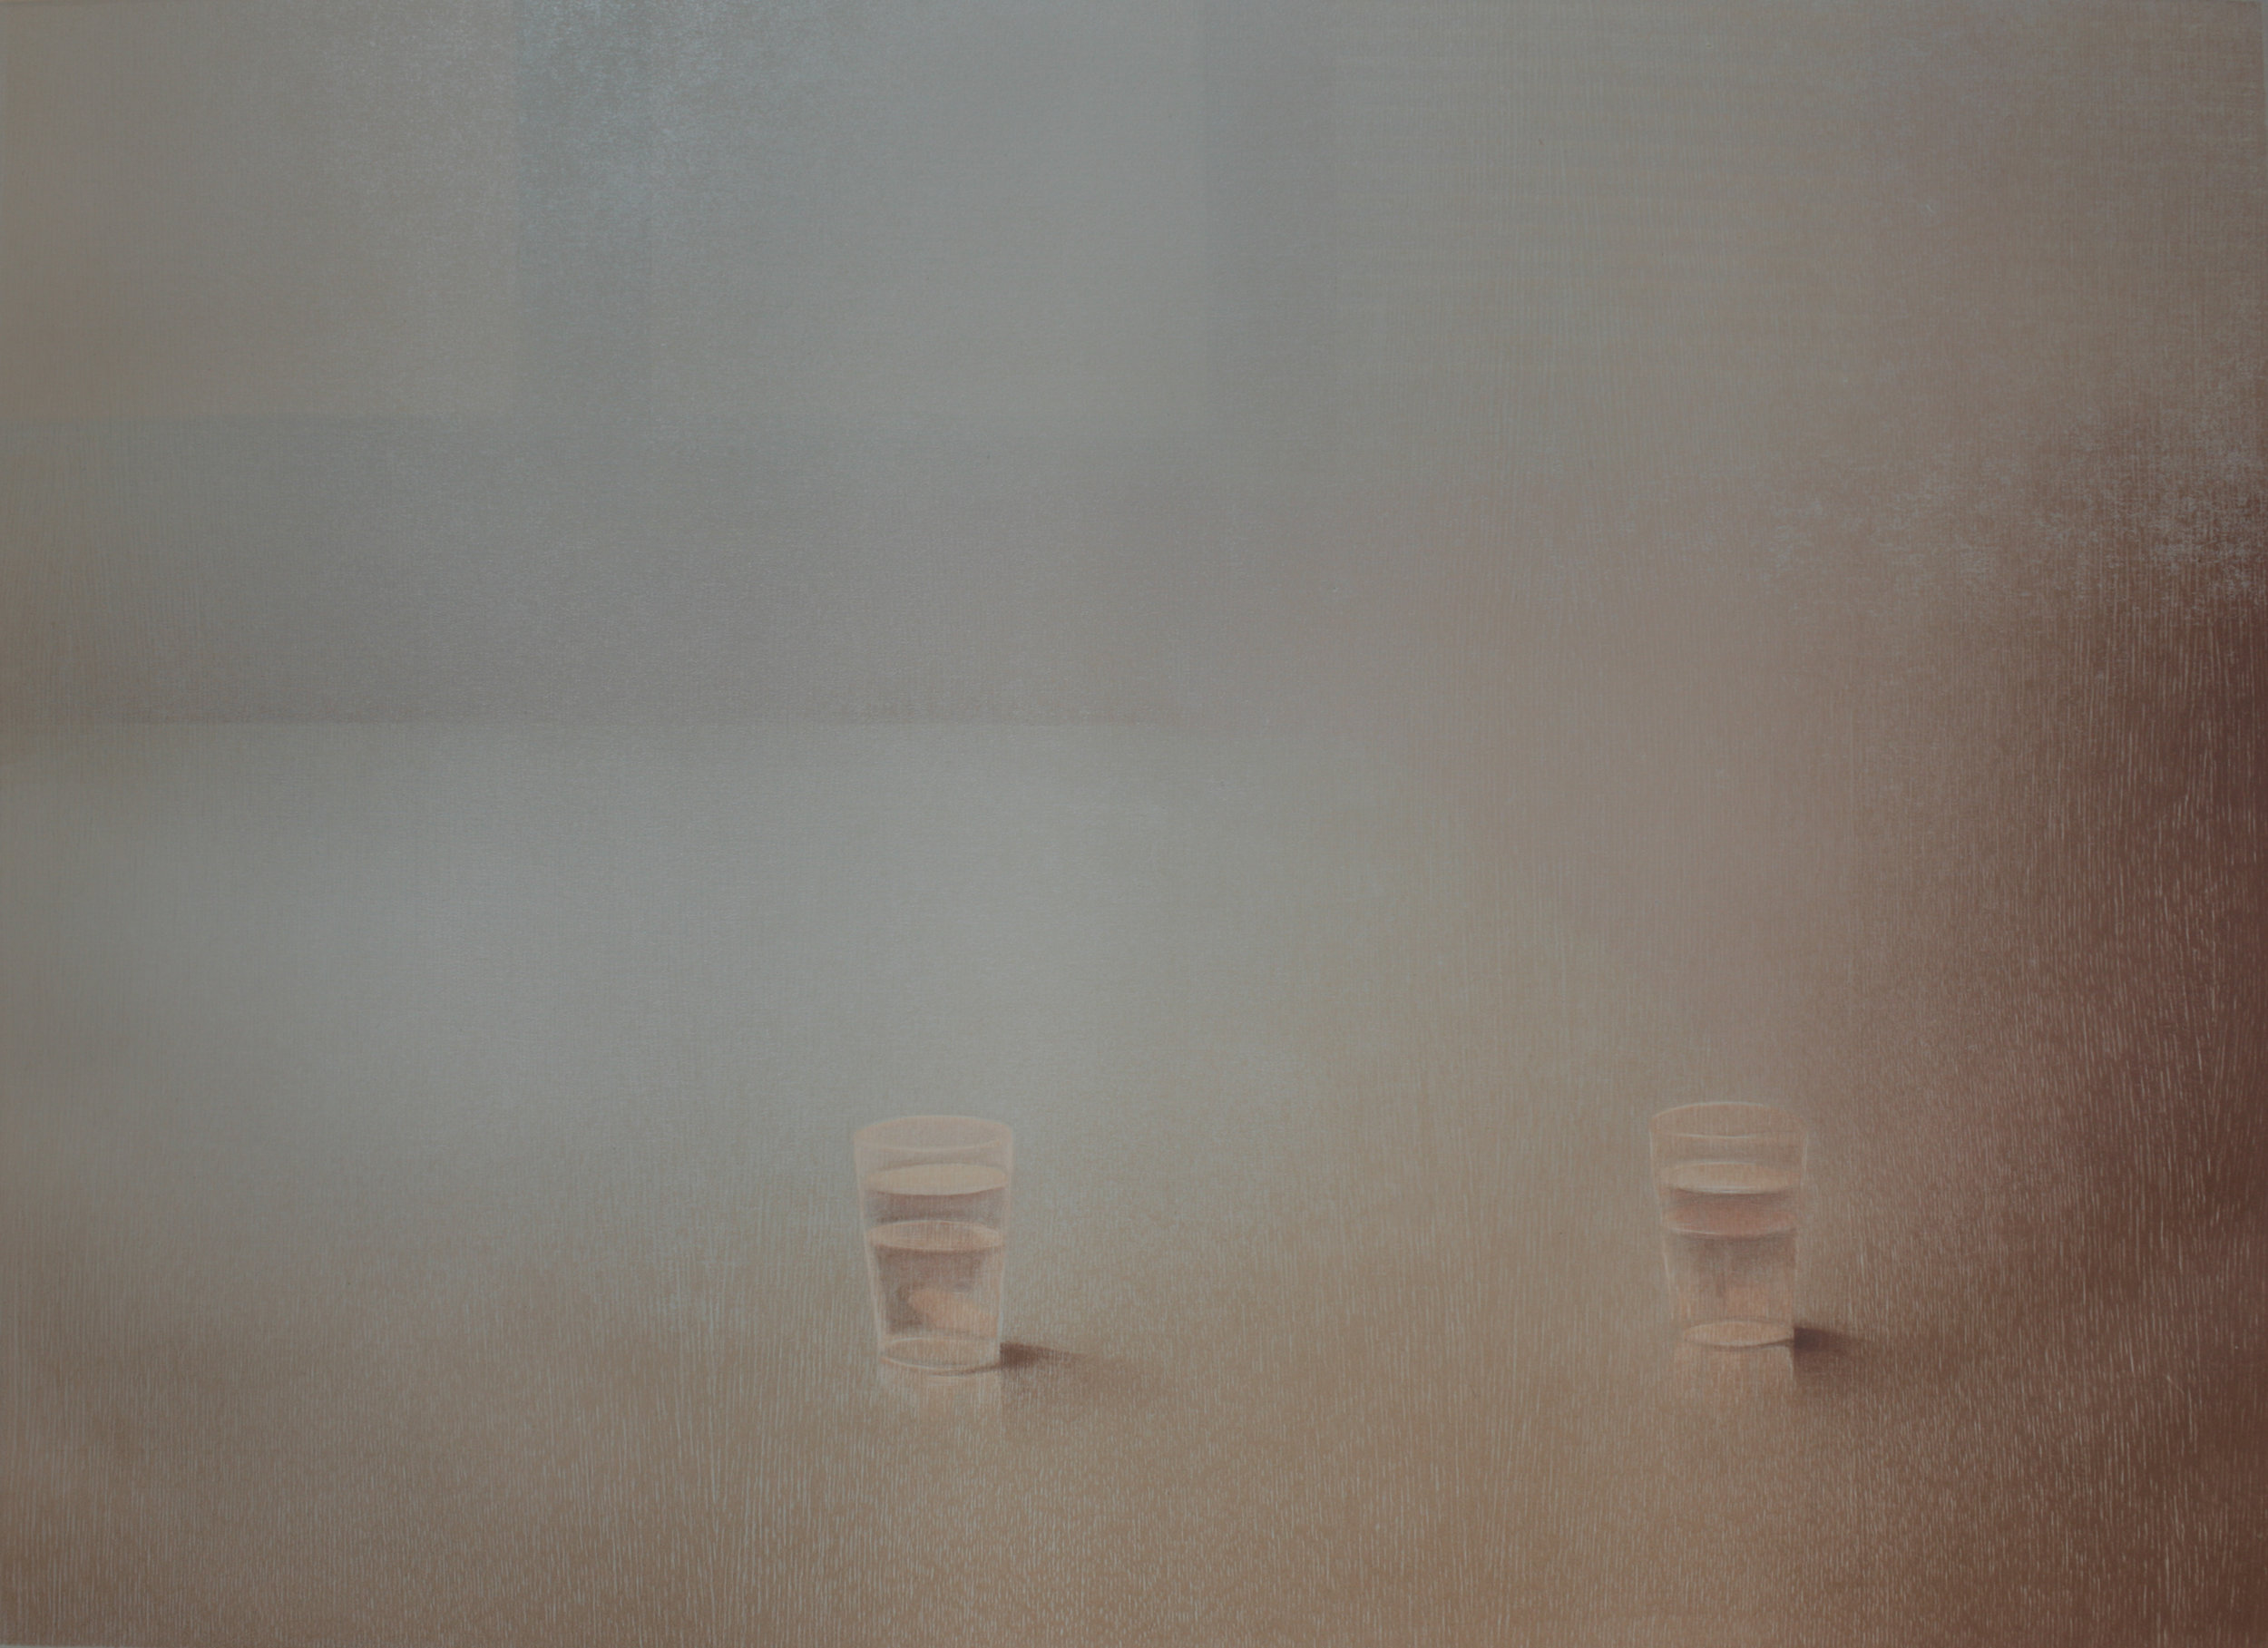 Praween PIANGCHOOMPU, Sanctuary Inside The Soul #29, 2018, Woodcut on Paper, 2 of 5, 59 x 84 cm, Affinity Art-Edit.jpg